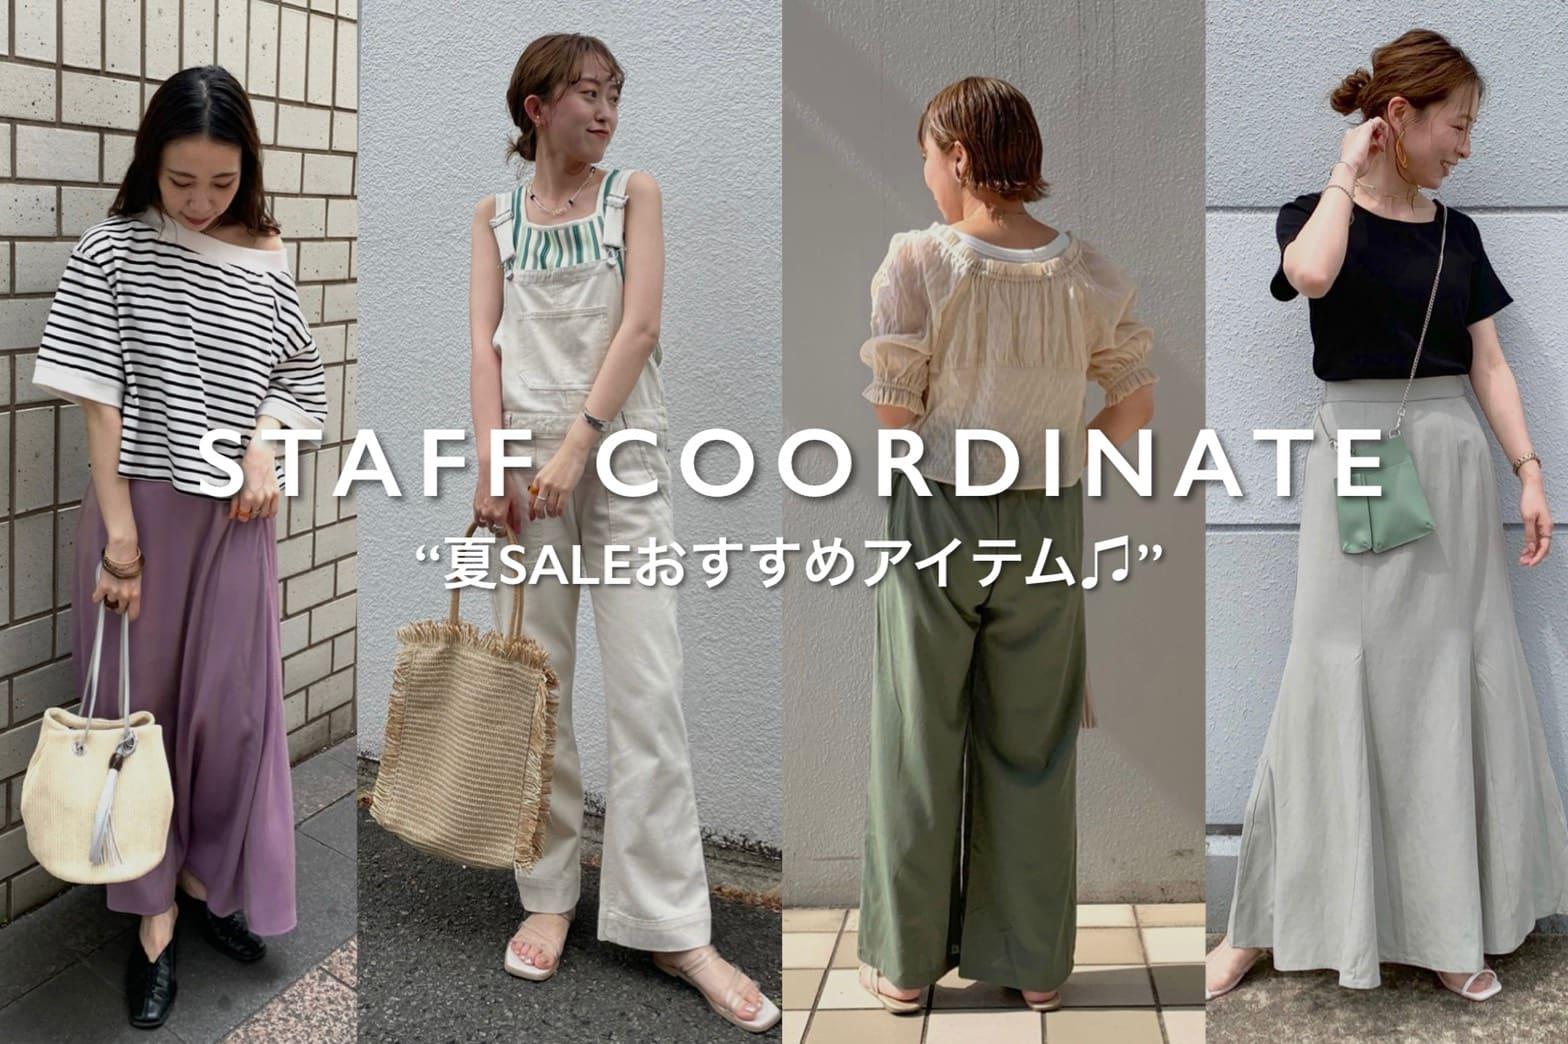 Discoat 【STAFF COORDINATE】夏SALEおすすめアイテム♪